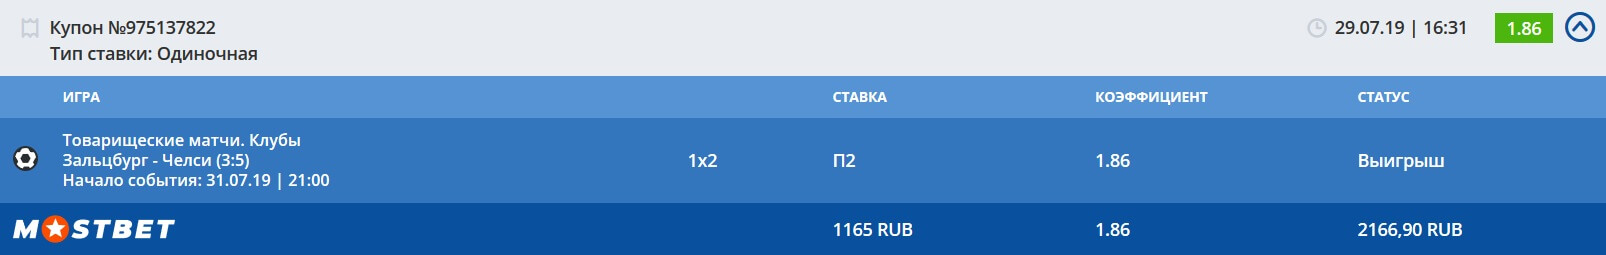 РБ Зальцбург - Челси, Результаты Ставки